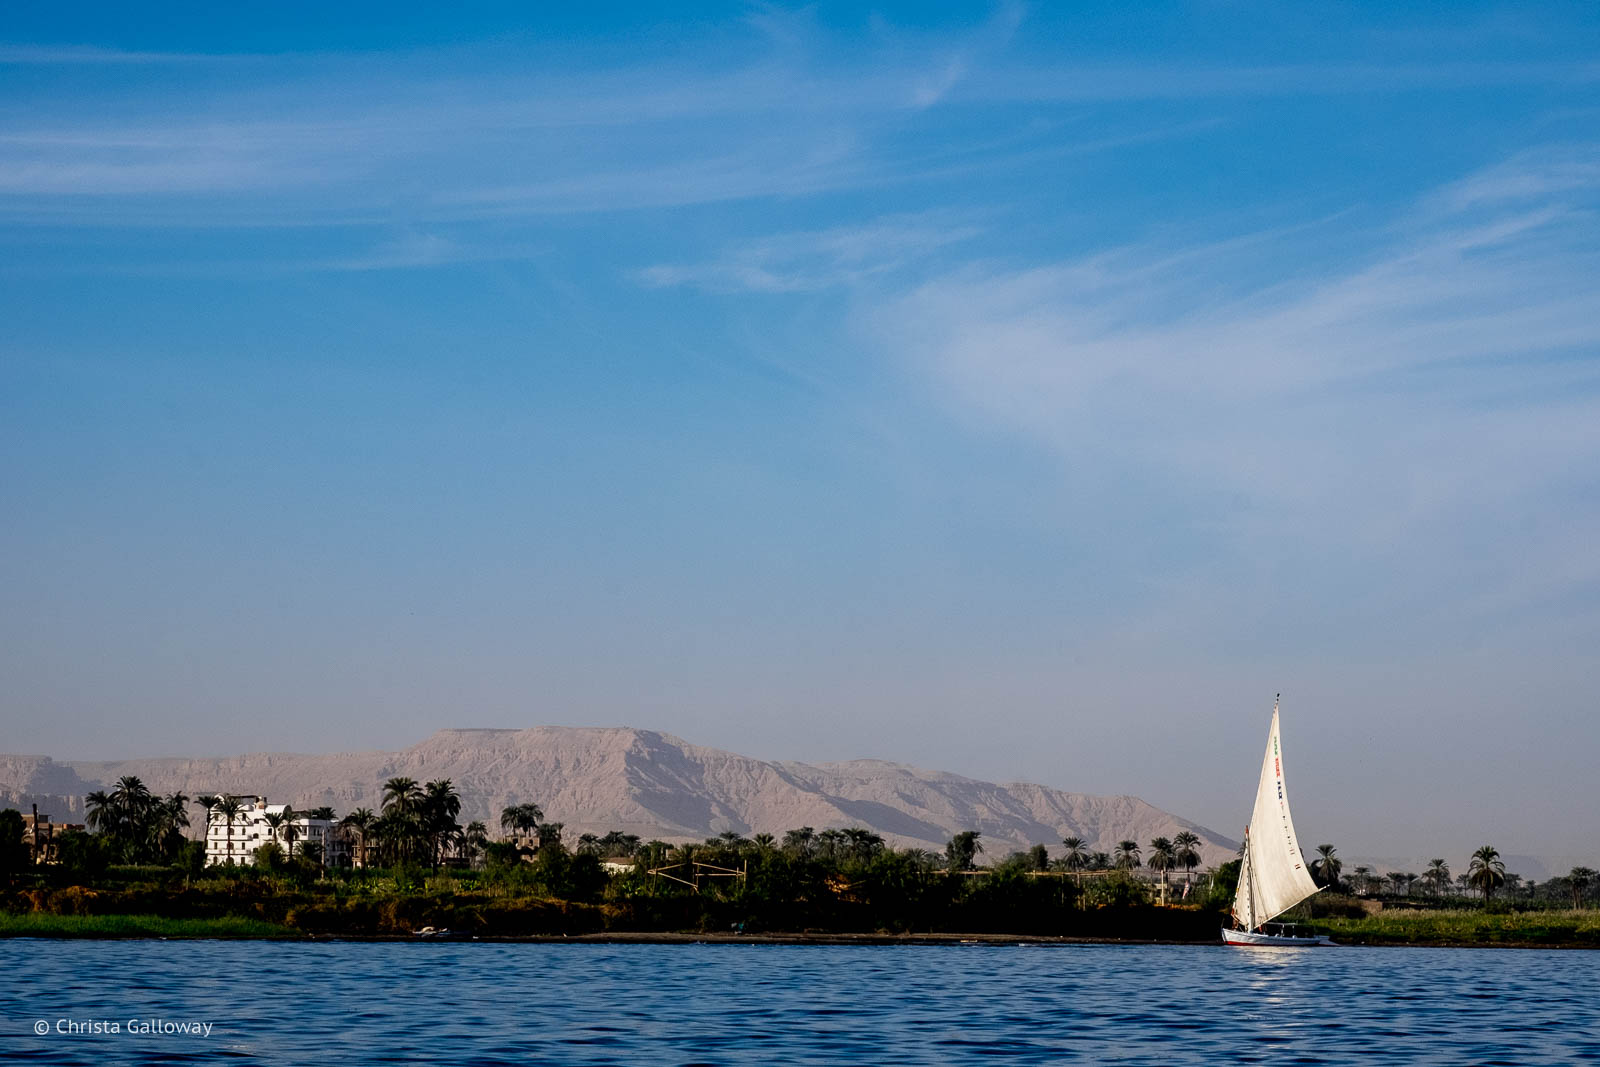 felucca-sailing-trip-nile-ckgalloway-3423.jpg